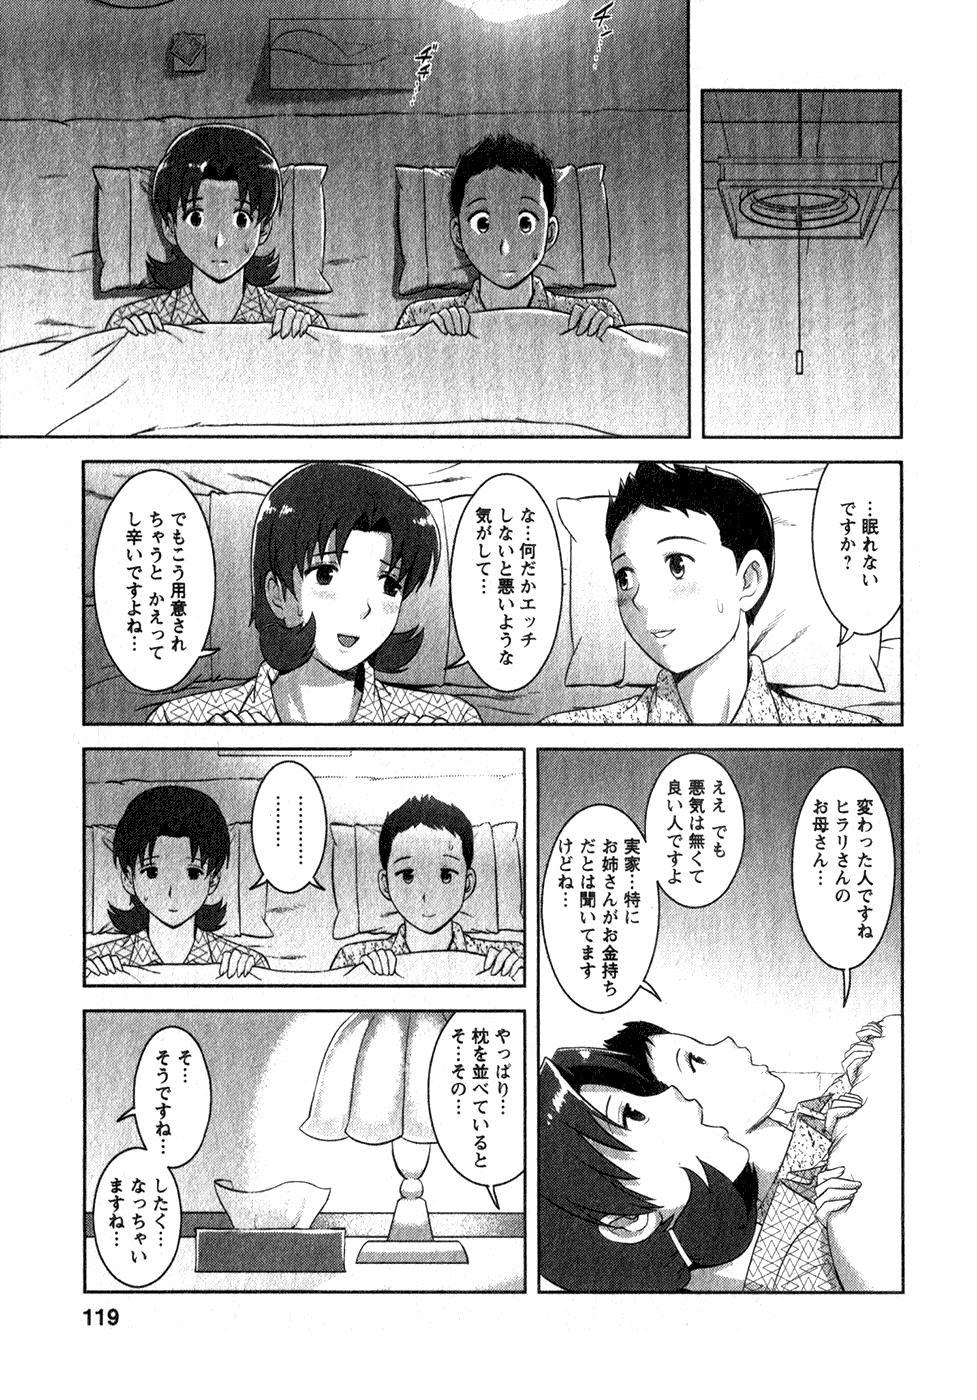 [Saigado] Kururi-san to Hirari-san Vol. 1 (Complete) 117